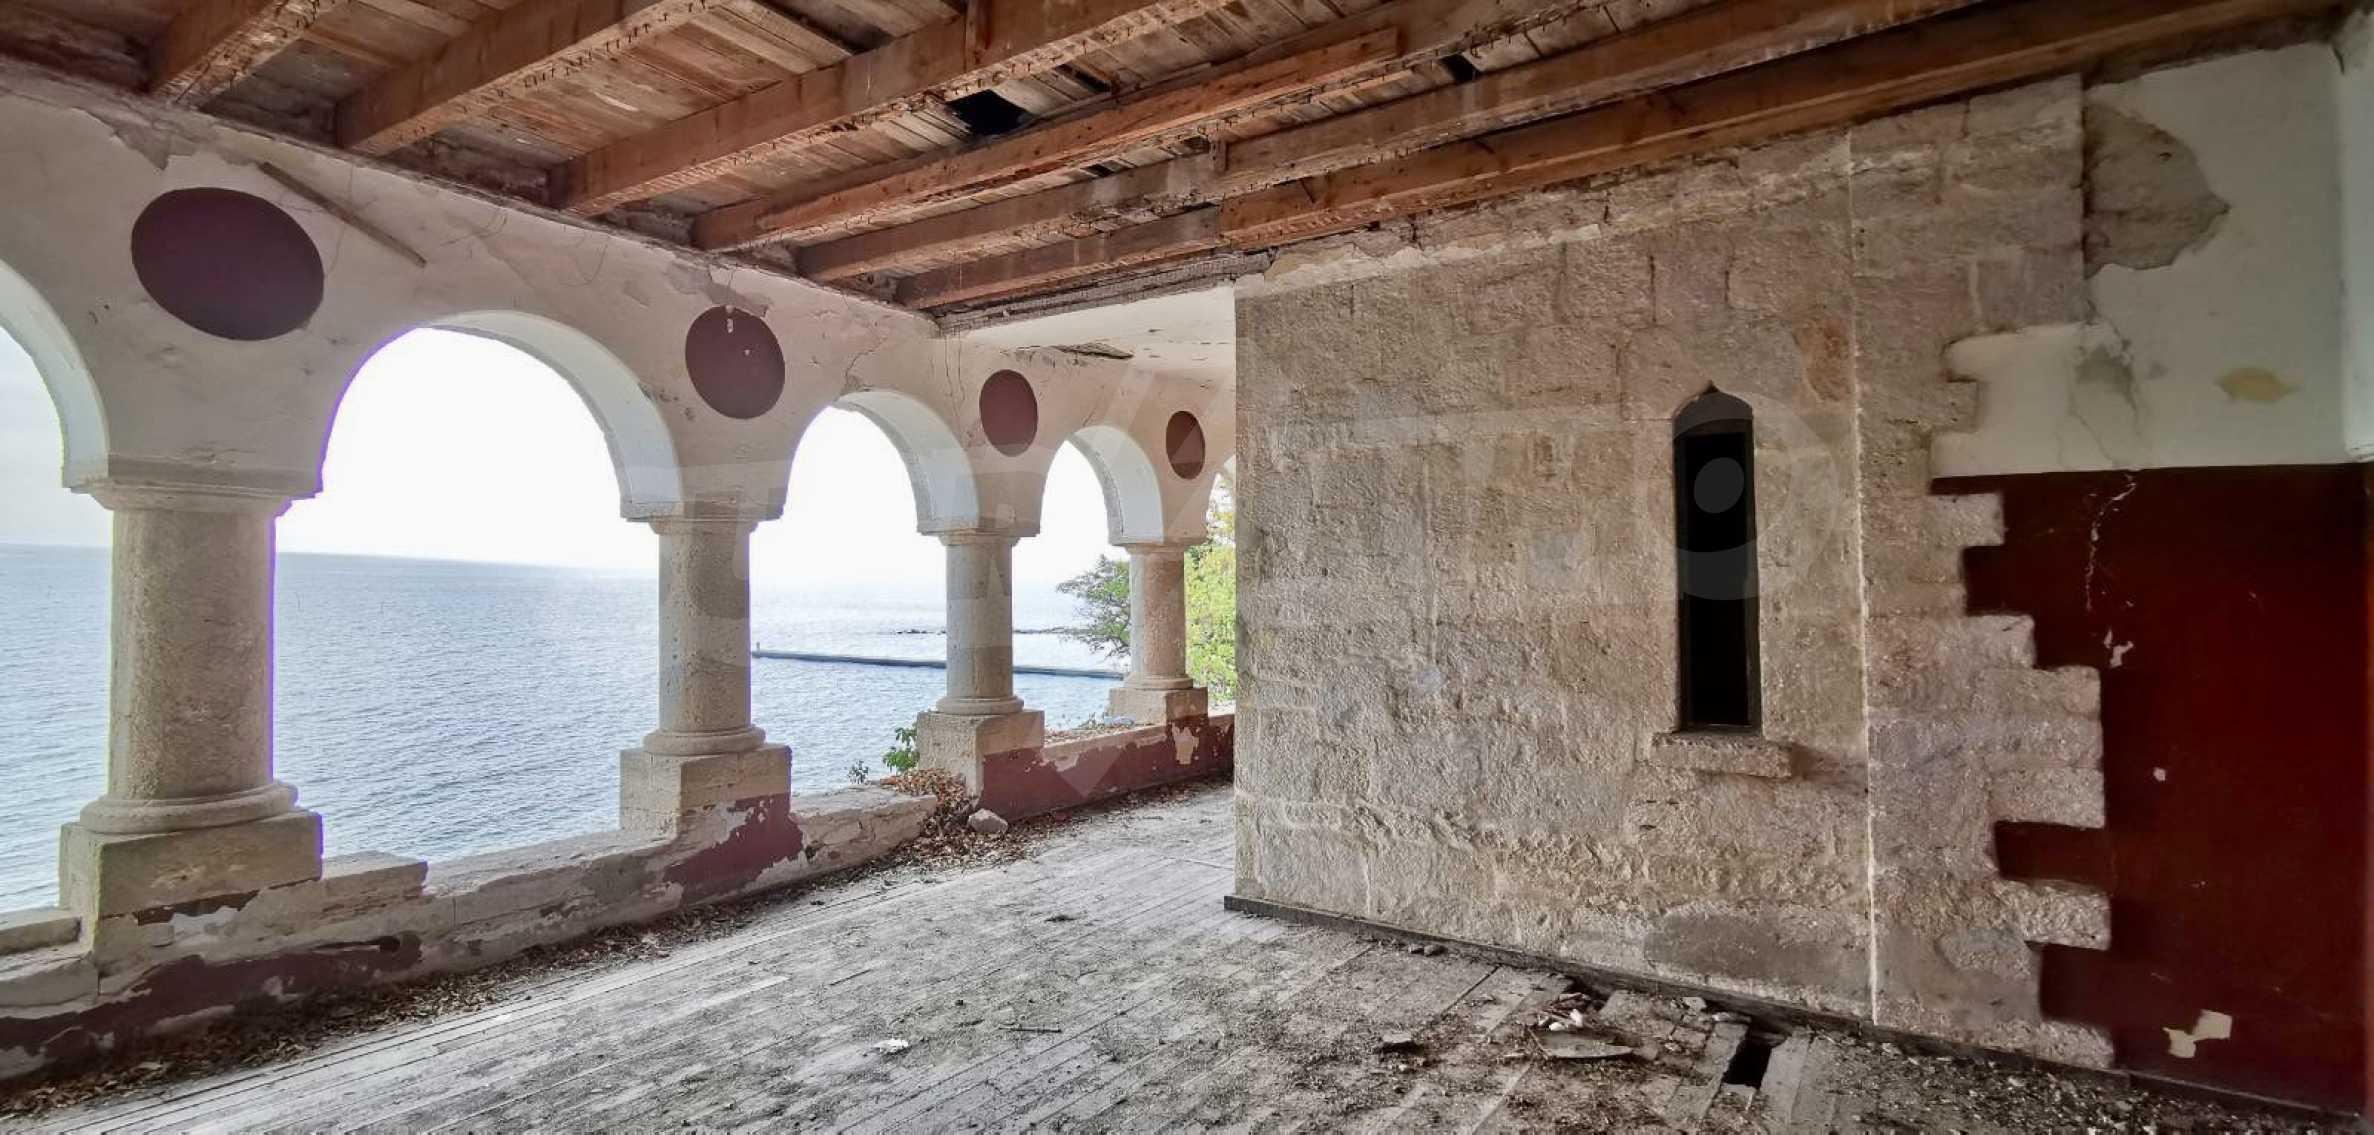 Villa Storck - an aristocratic mansion on the beach 3